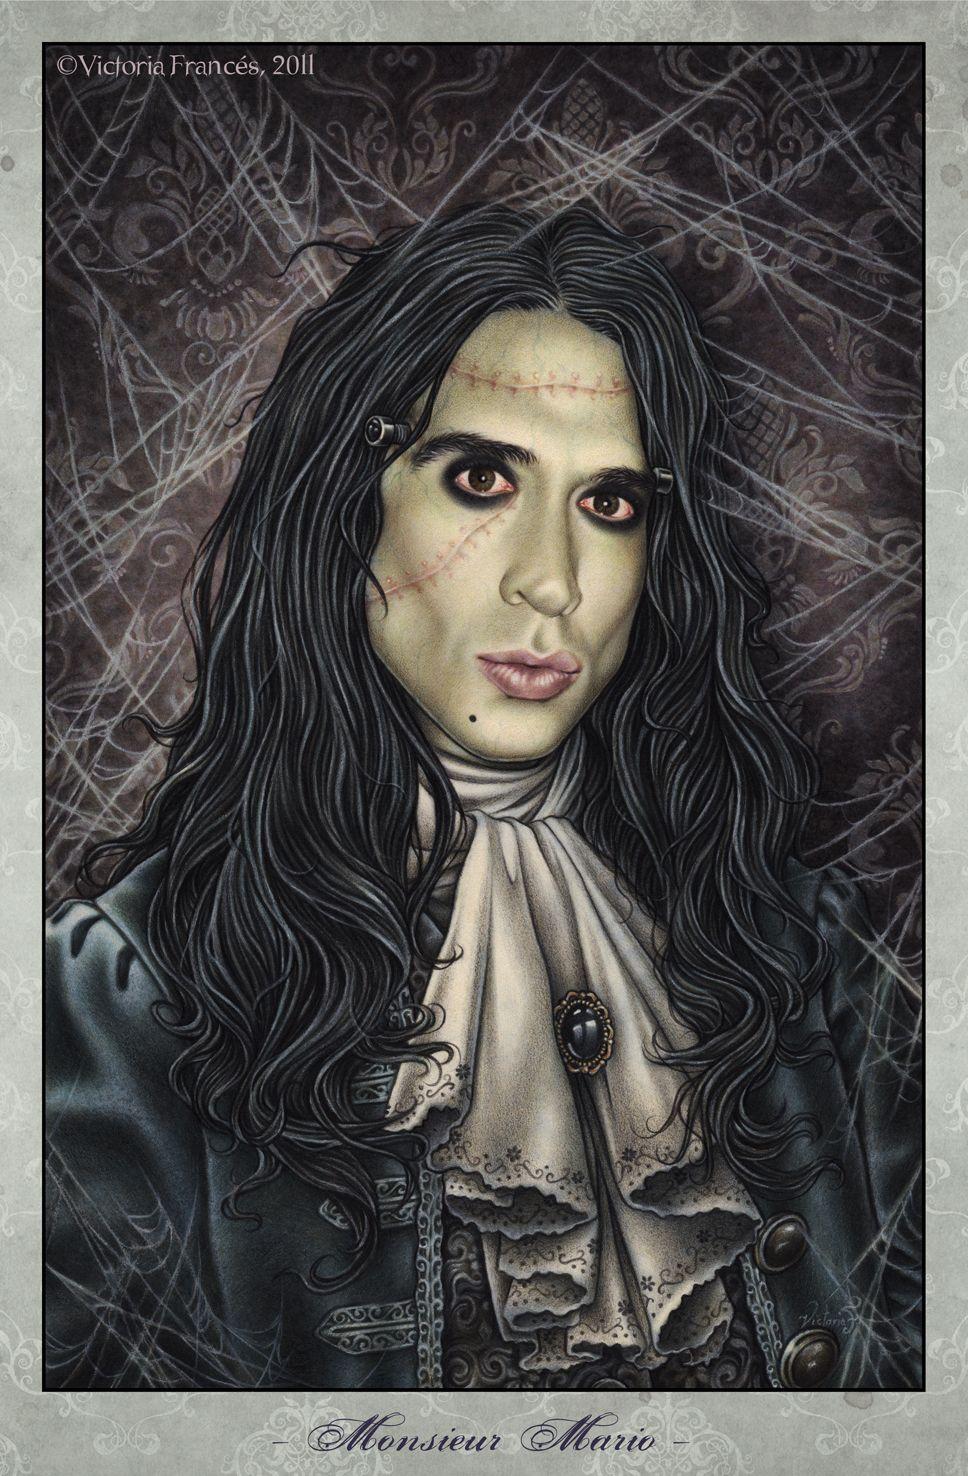 Monsieur mario victoria francis sci fi horror for Victoria frances facebook